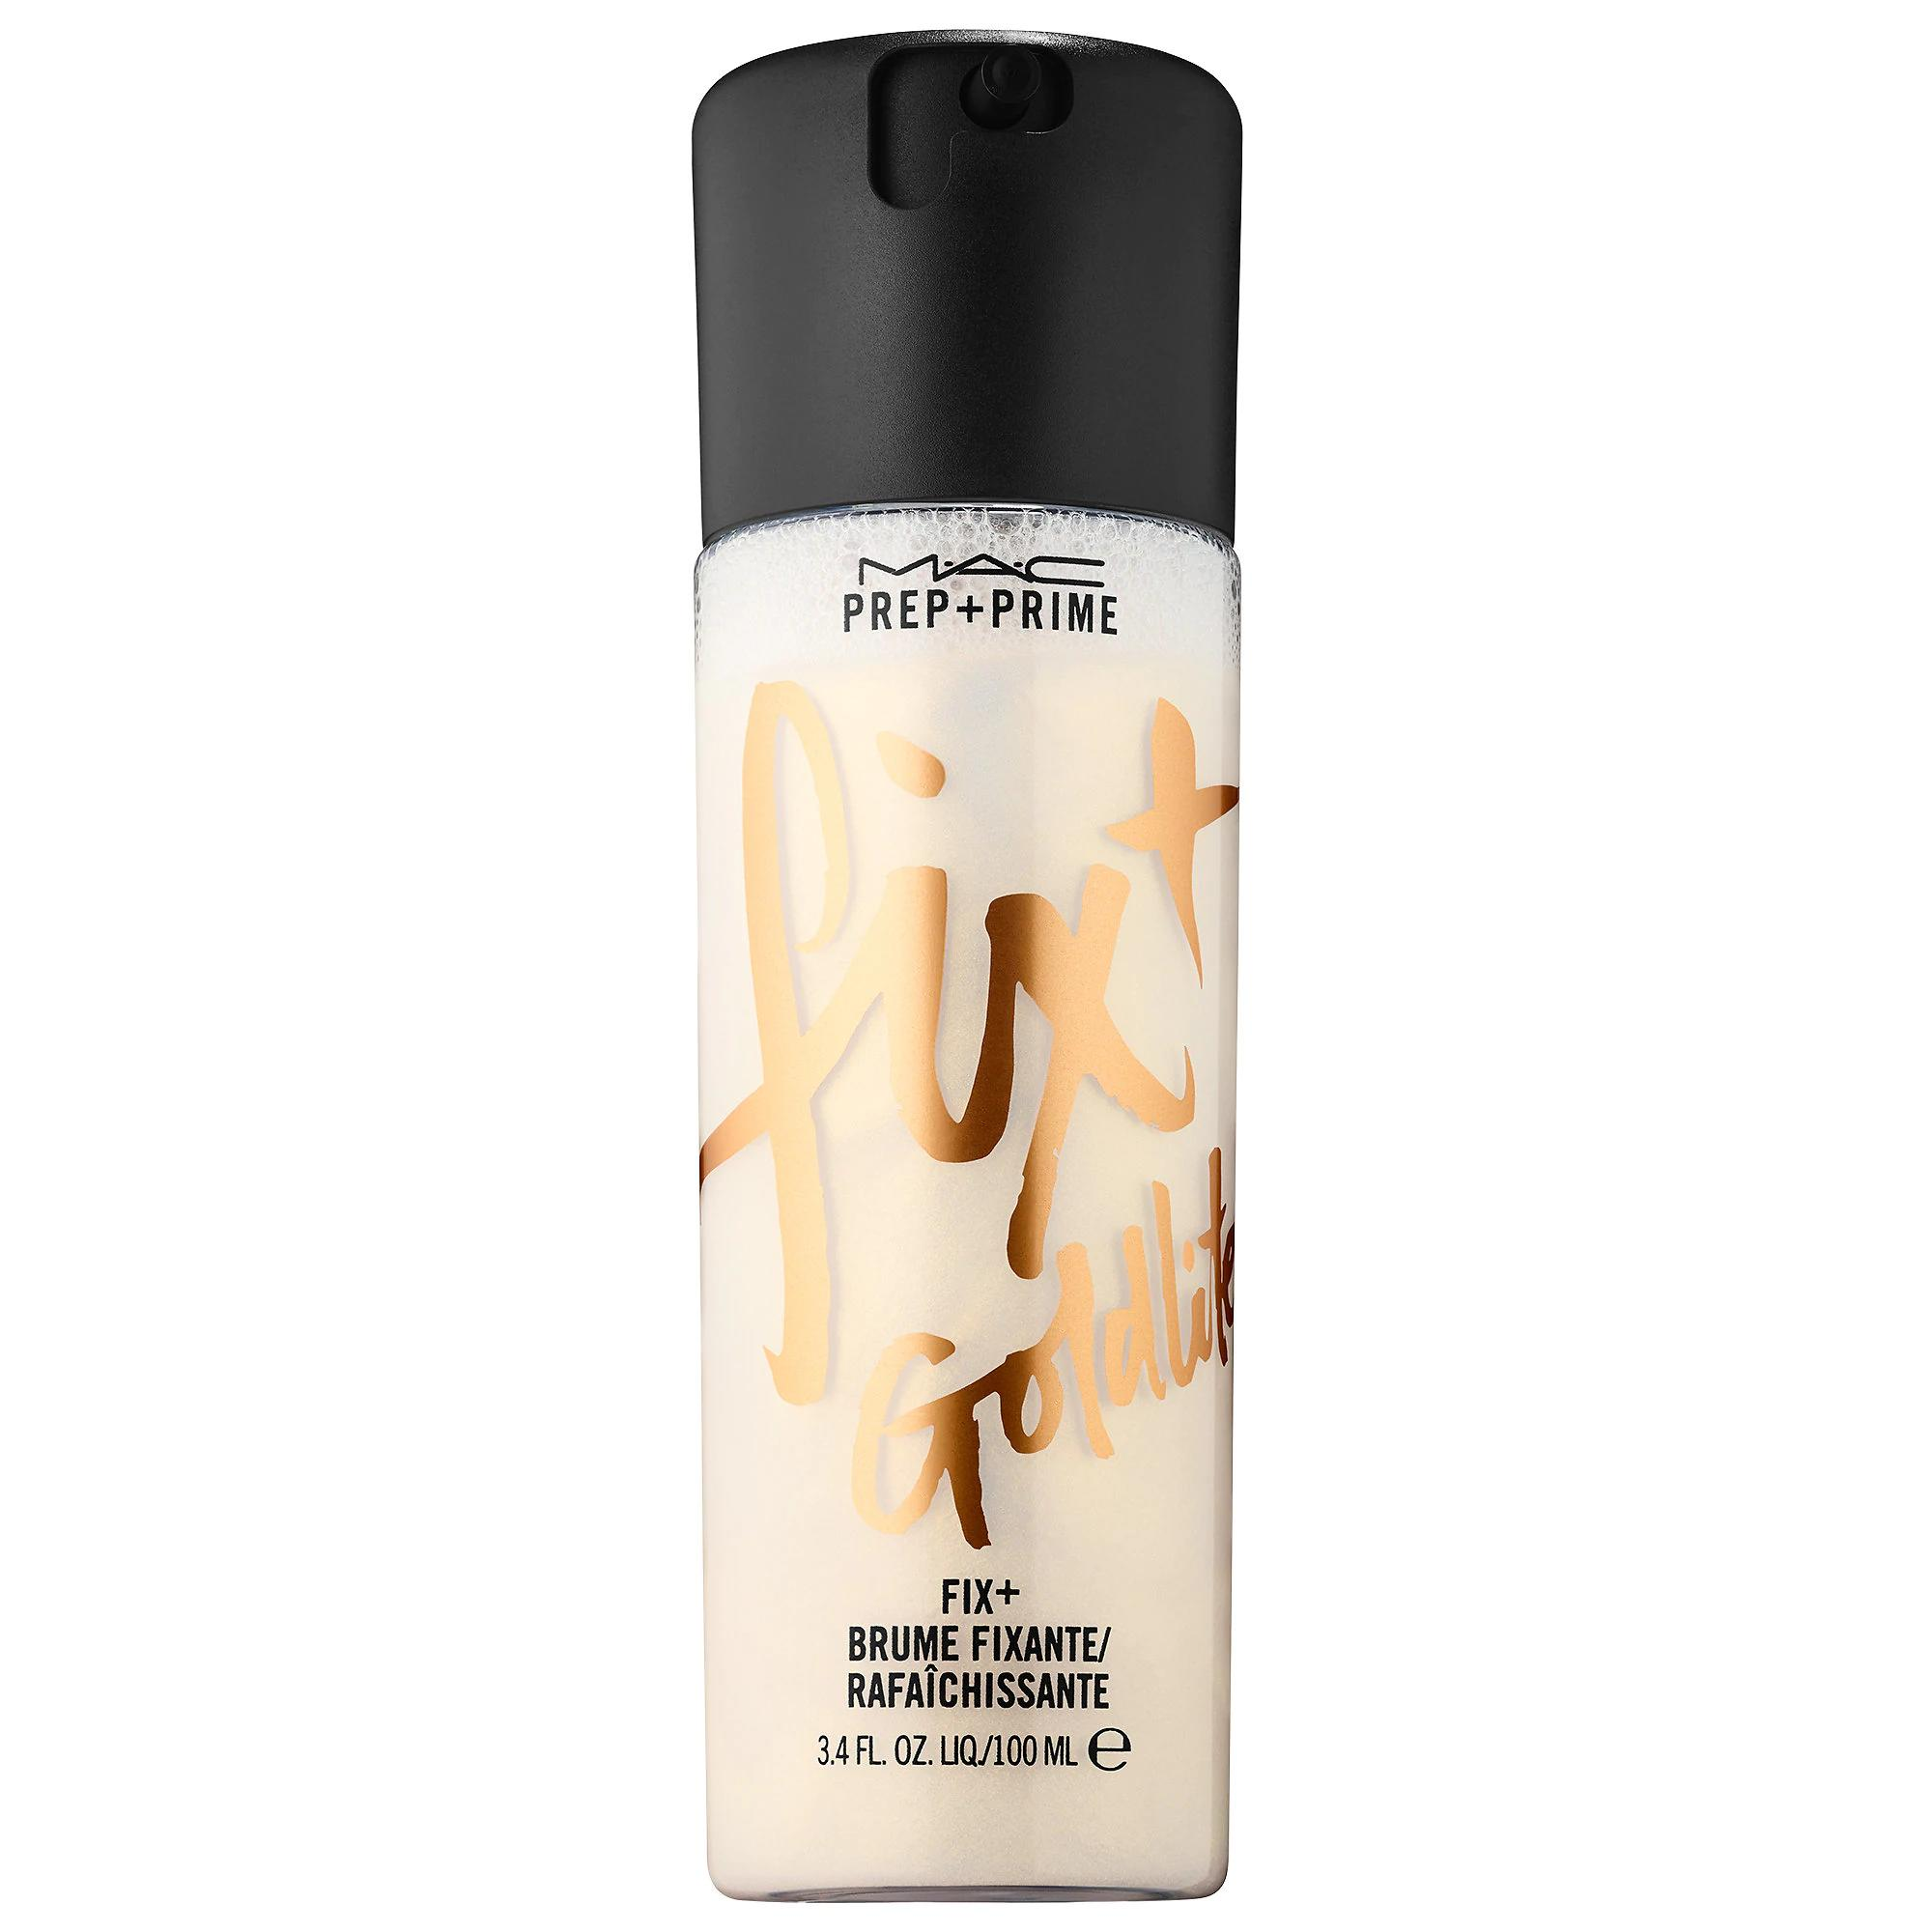 MAC Prep + Prime Fix+Skin Refresher Finishing Mist Goldlite